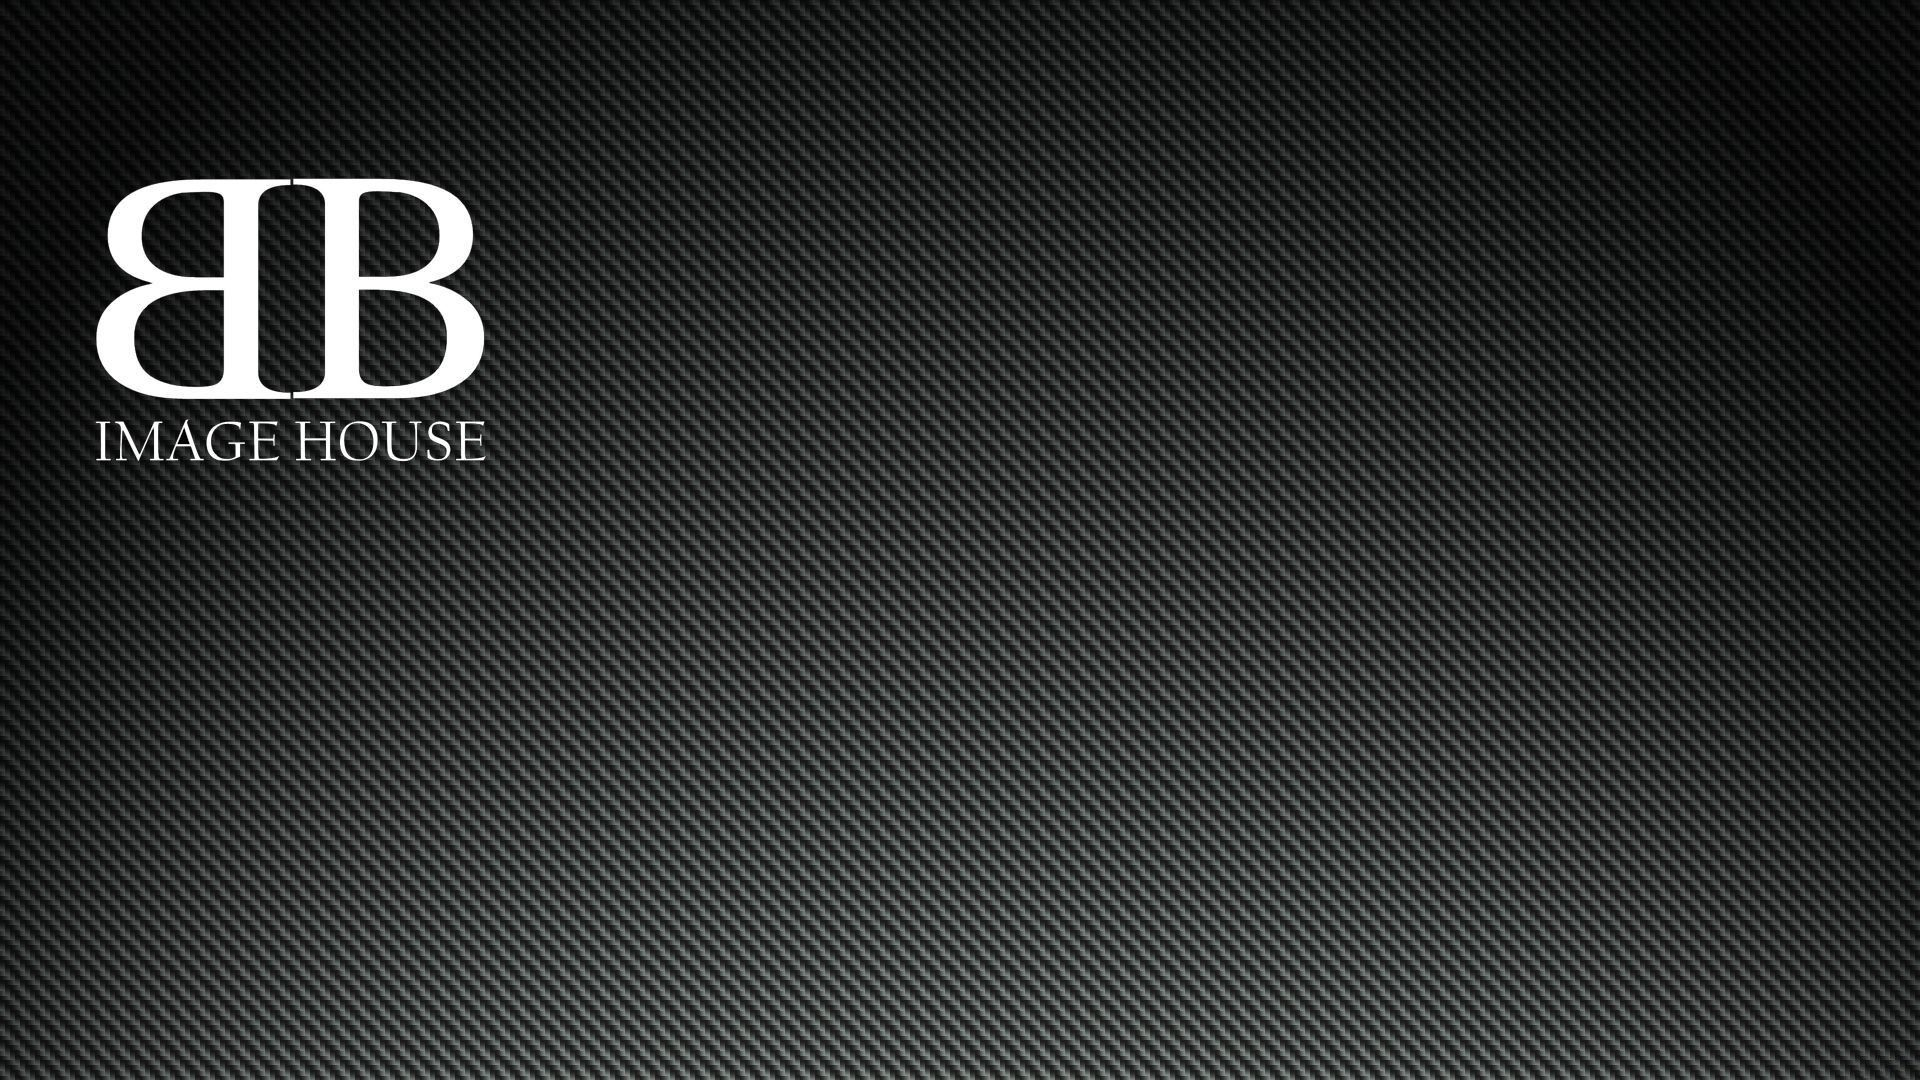 4K Ultra HD Carbon Fiber Wallpapers - Top Free 4K Ultra HD ...